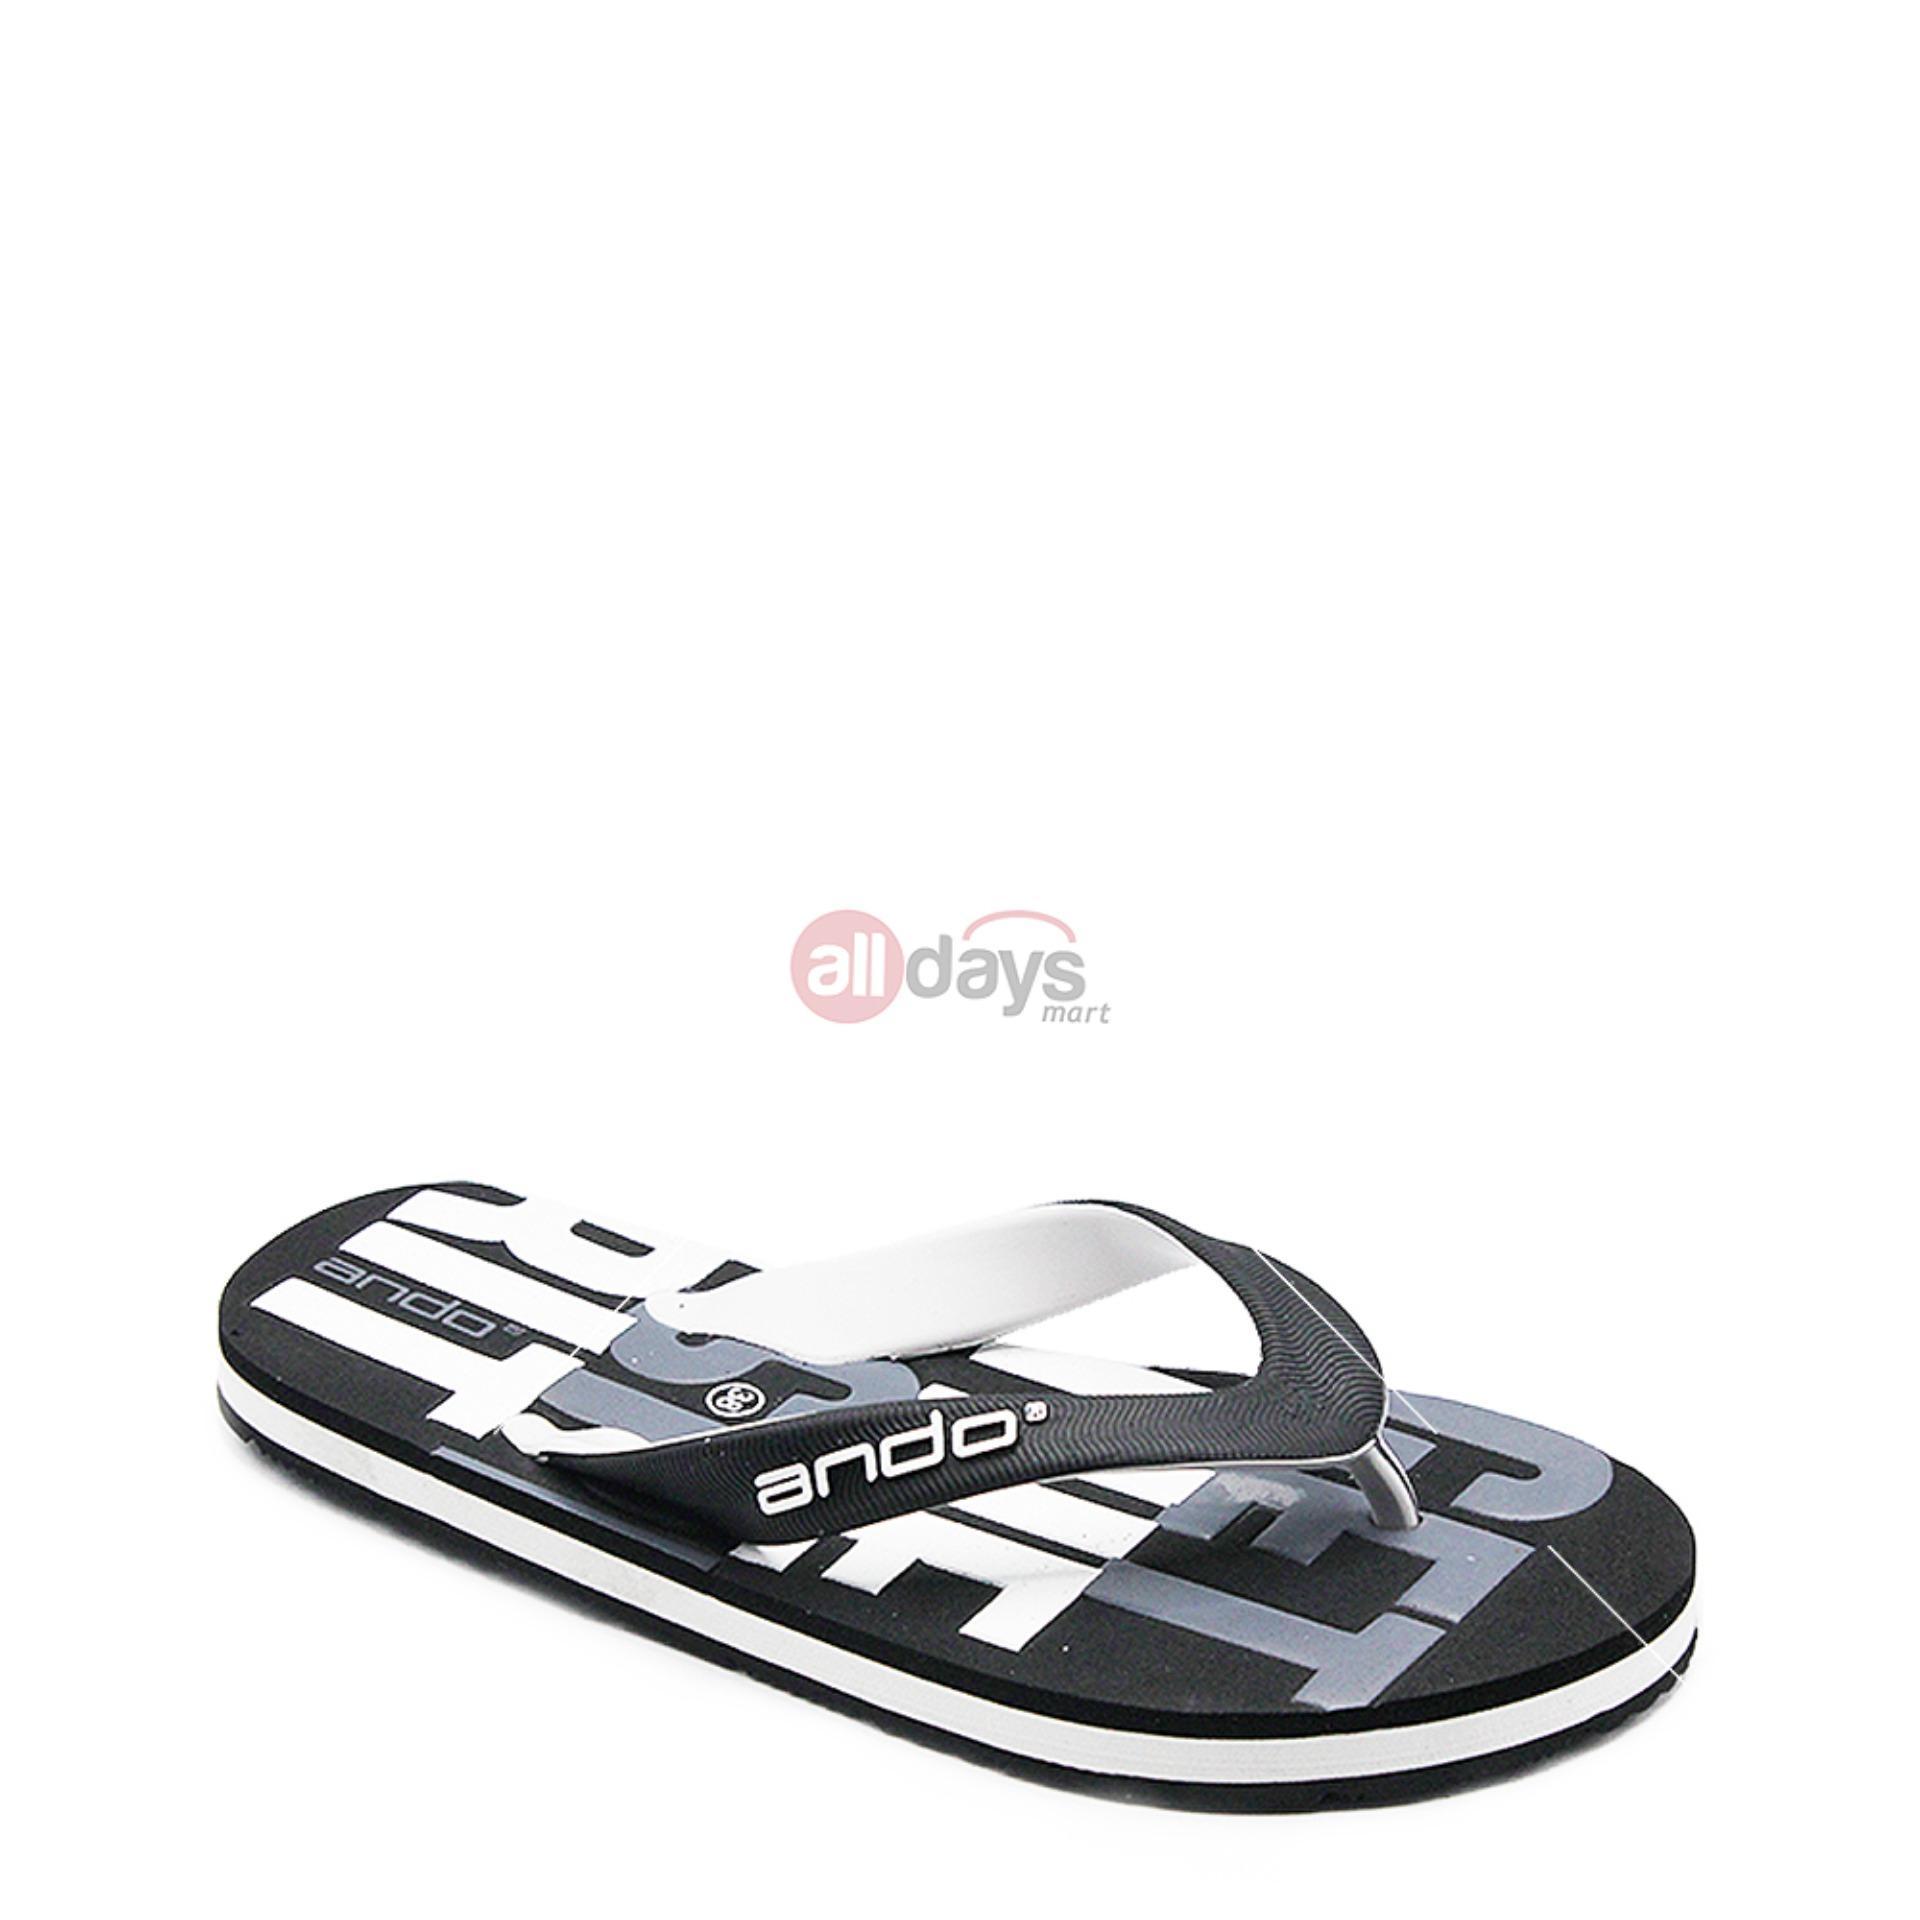 Ando Sandal Jepit Pria Grafitty 02 Black/White size 38 - 42